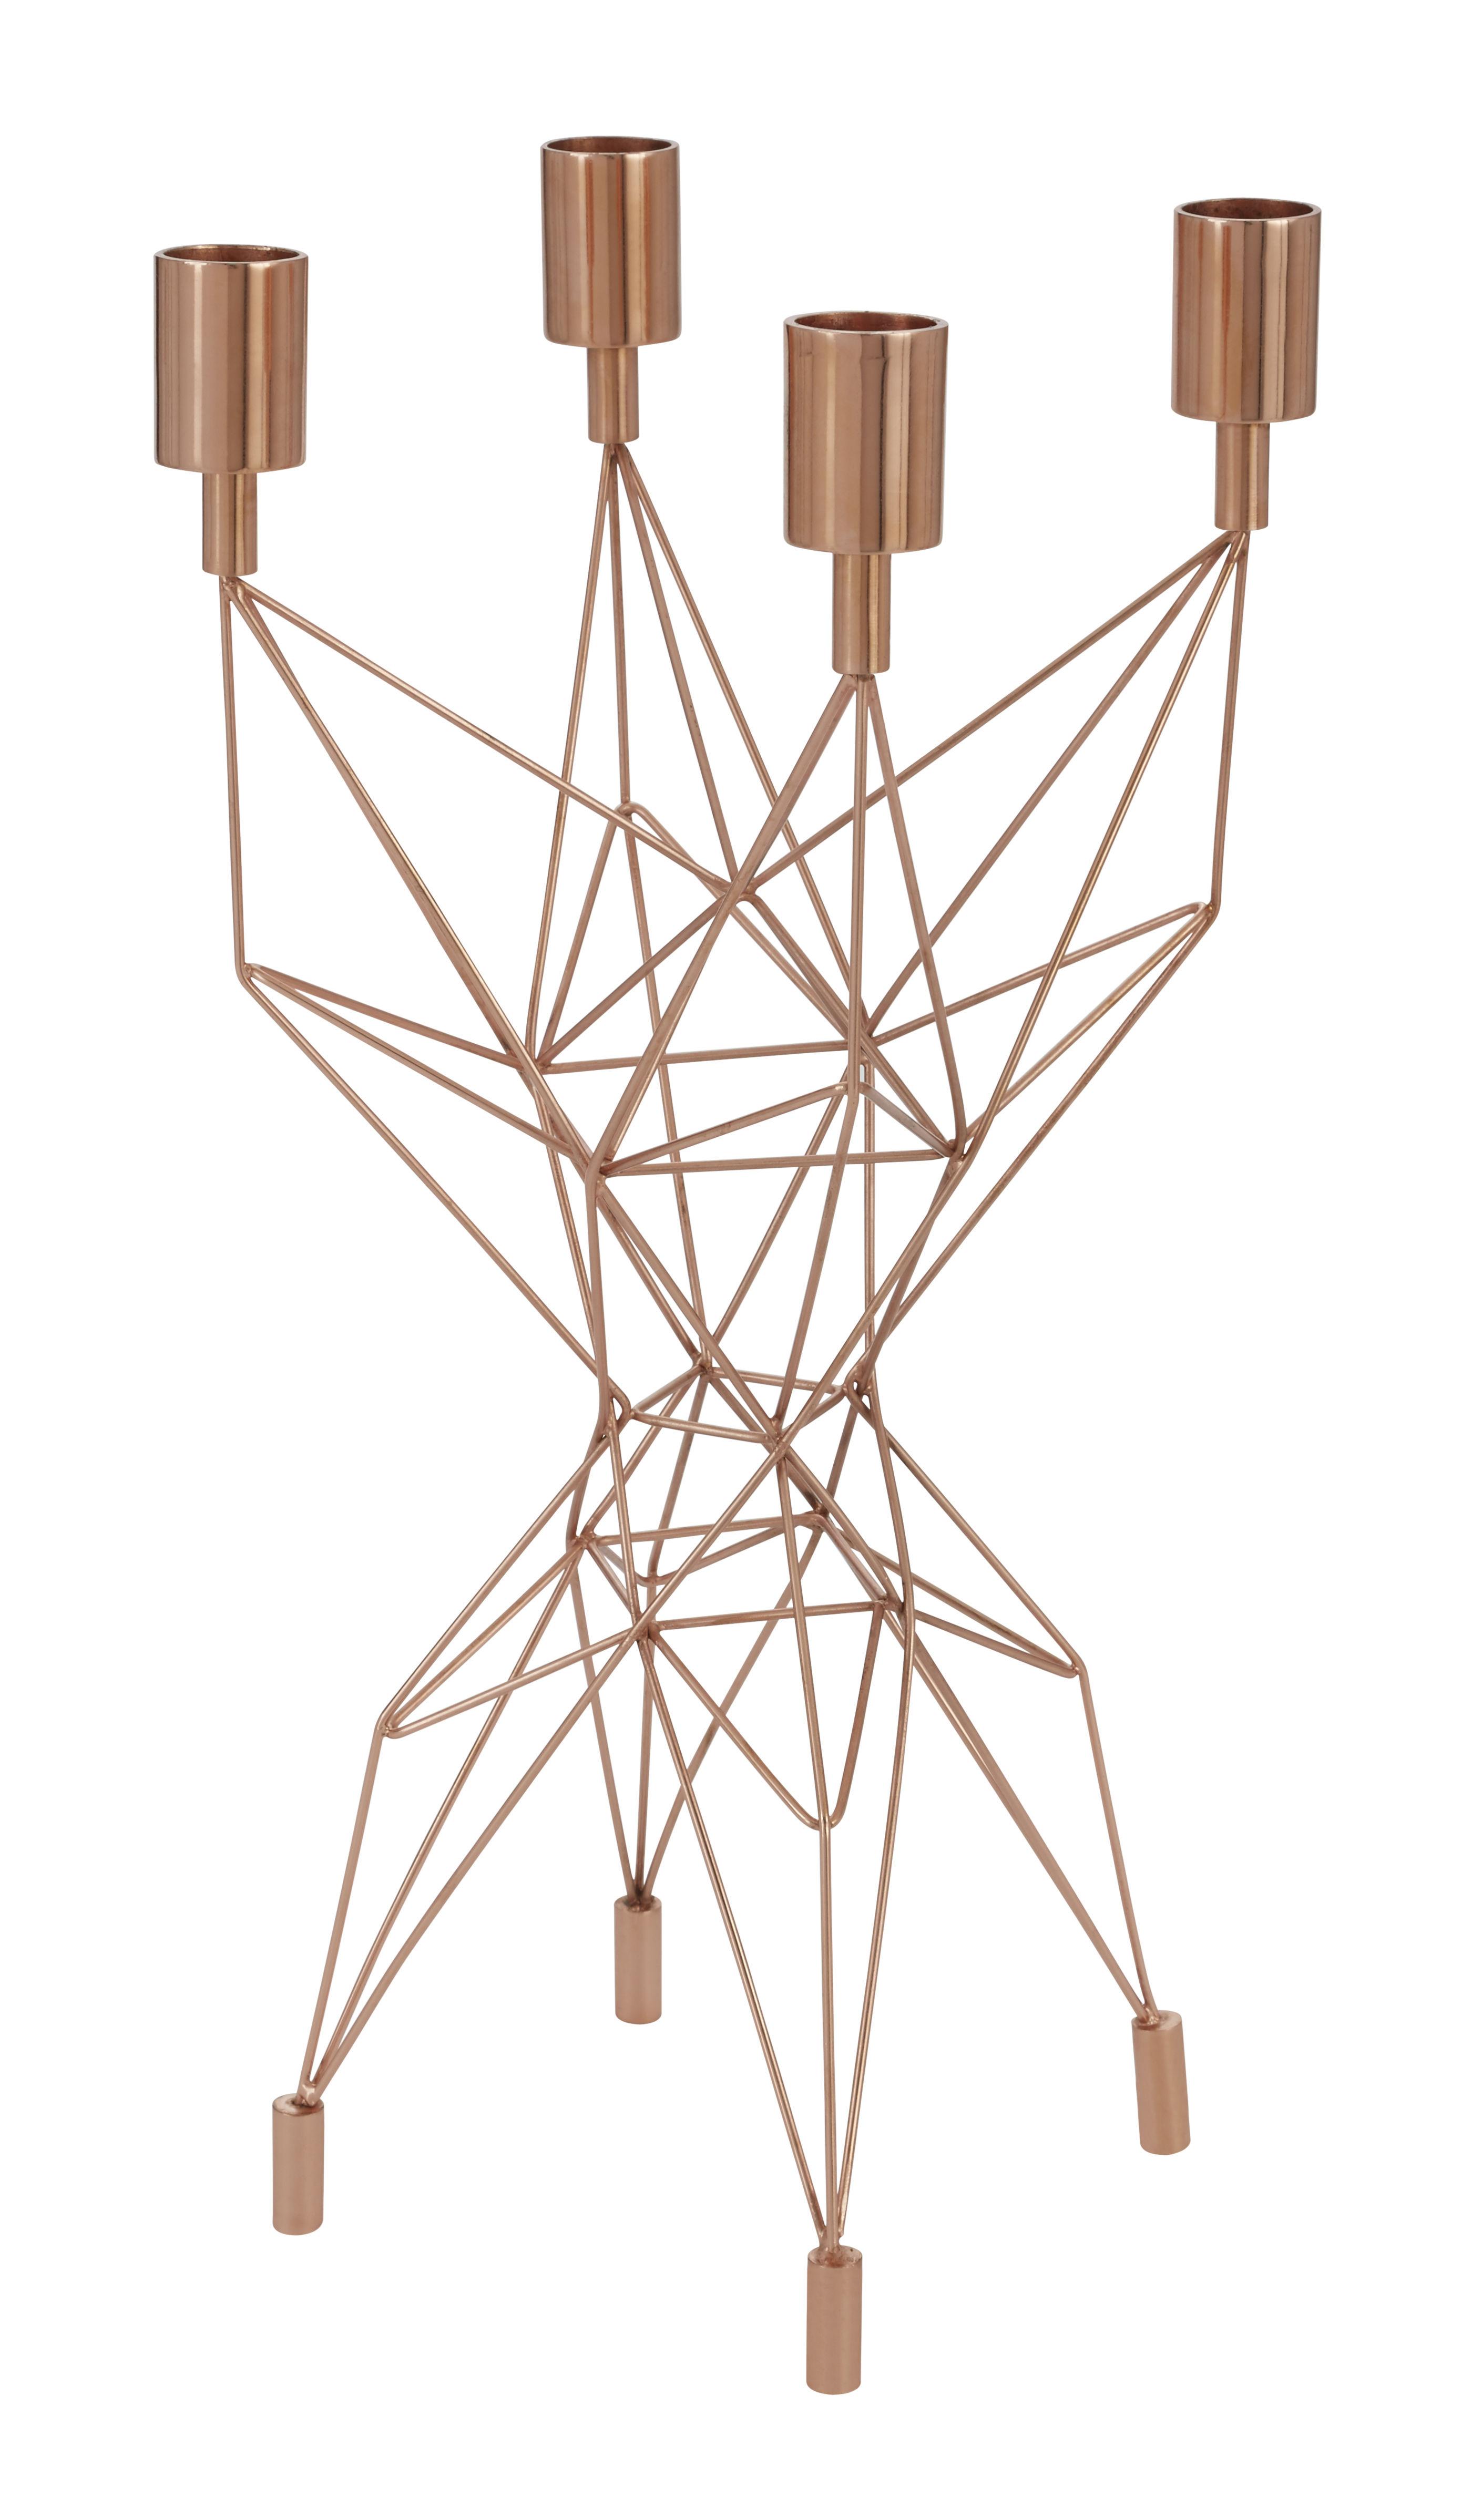 Pylon Kerzenleuchter Kupfer By Tom Dixon